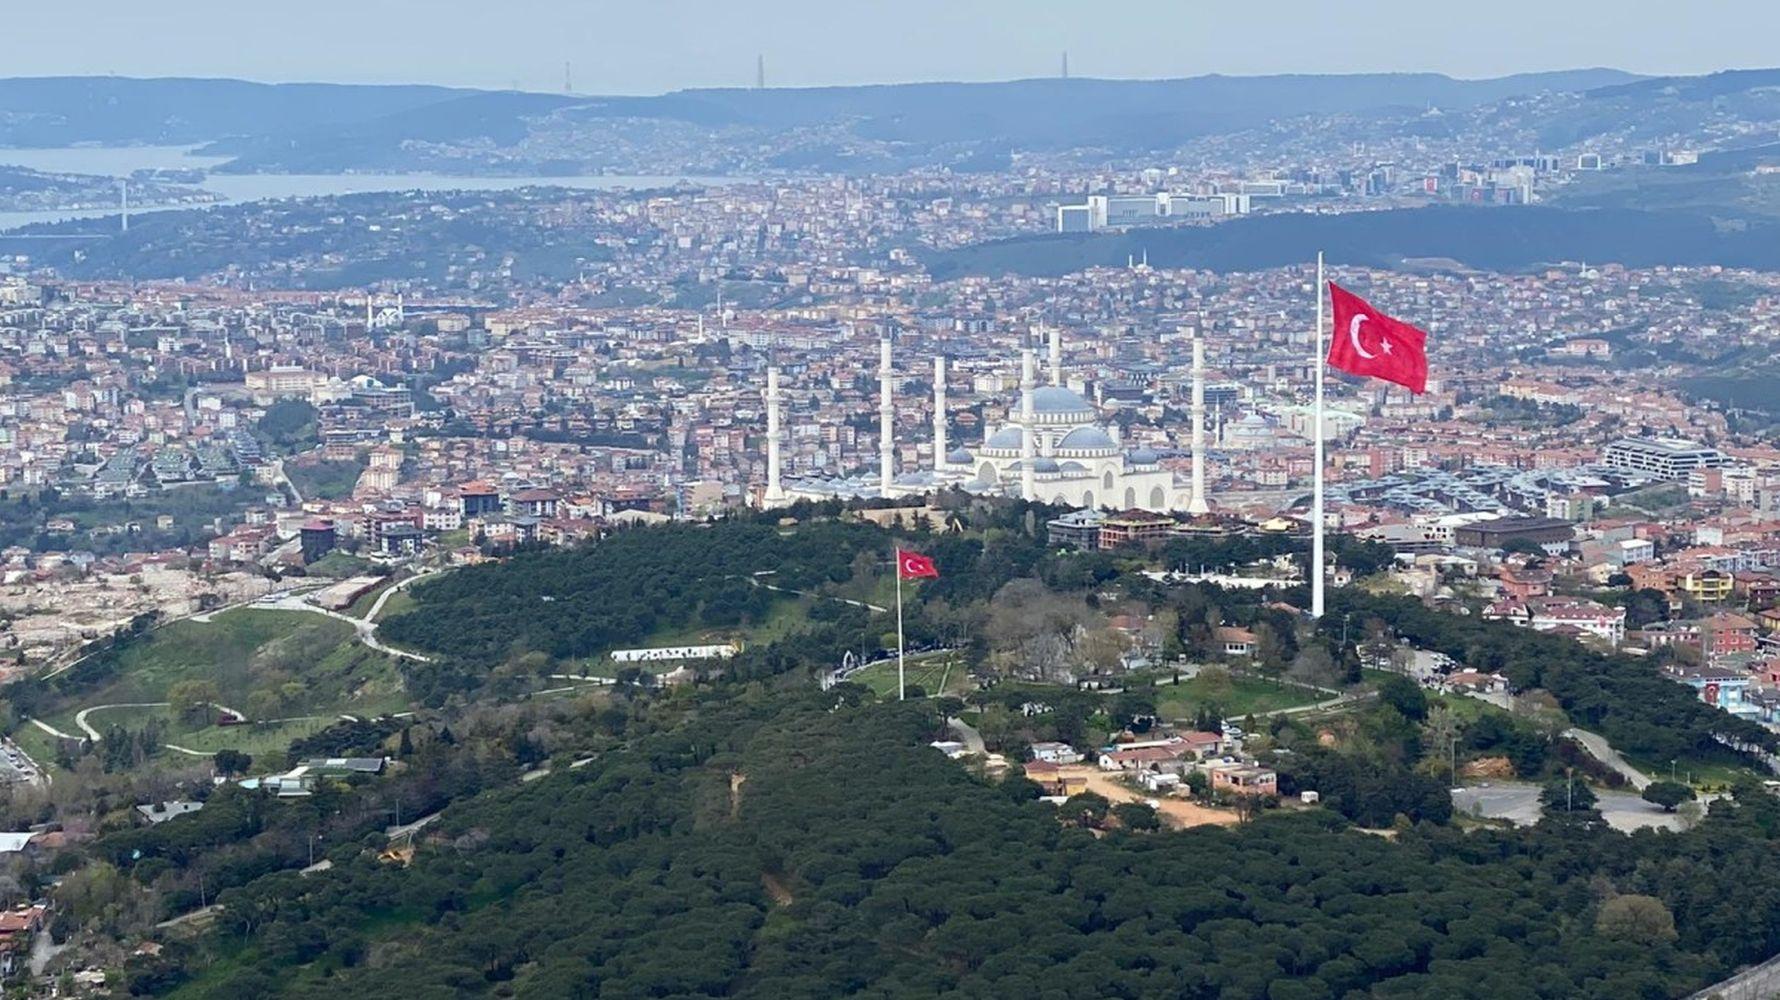 Turkiyenin the highest flagpole in the largest Turkish flag always dalgalandiracagiz